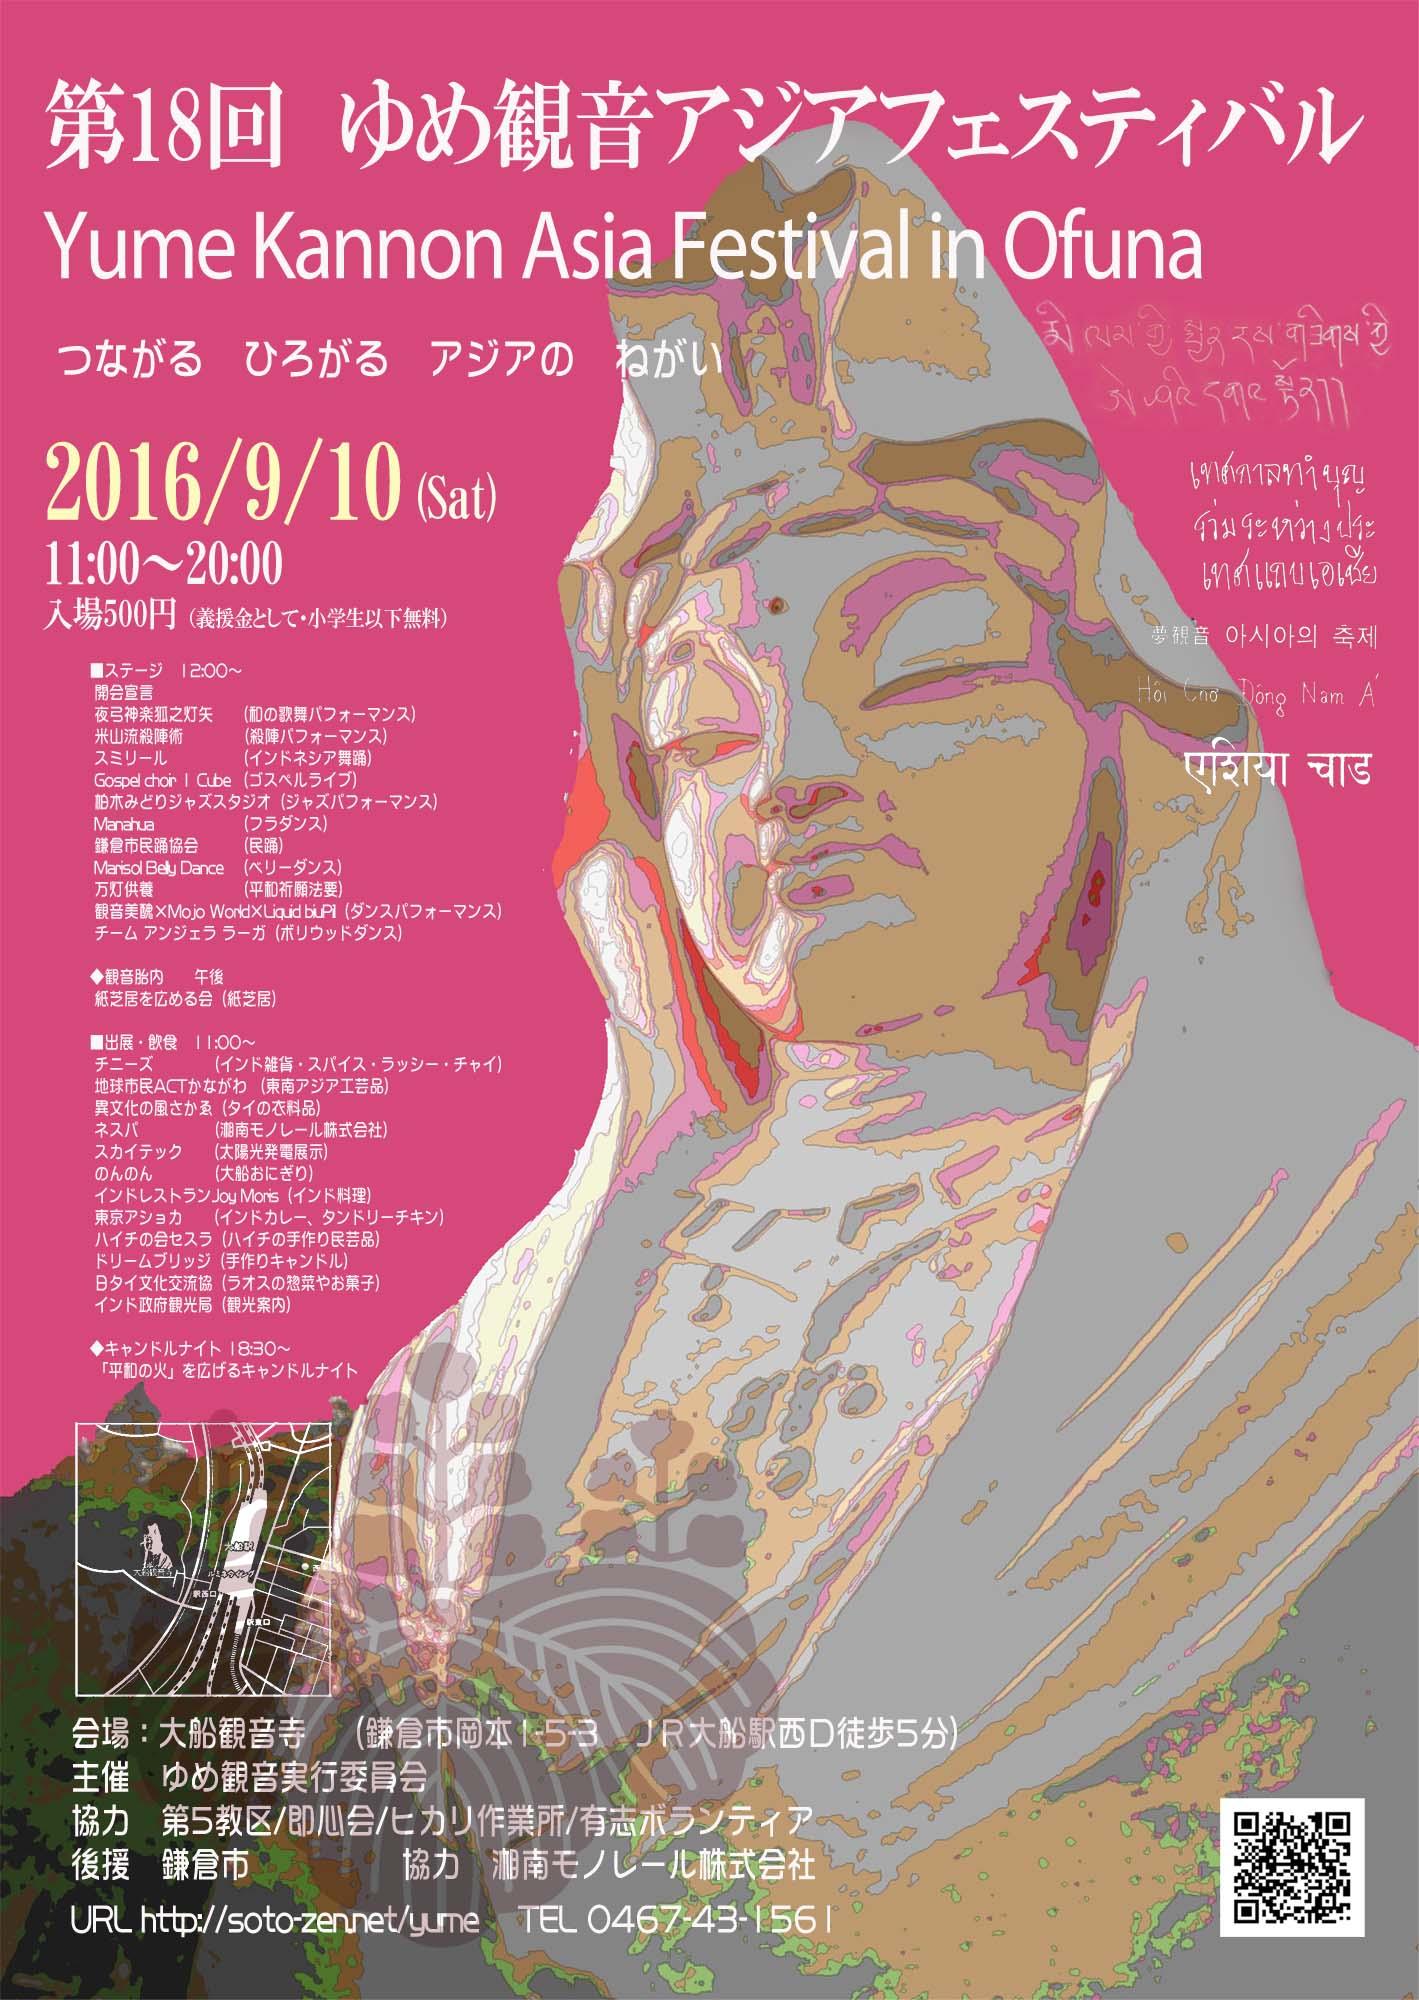 http://soto-zen.net/yume/2016-omote.jpg